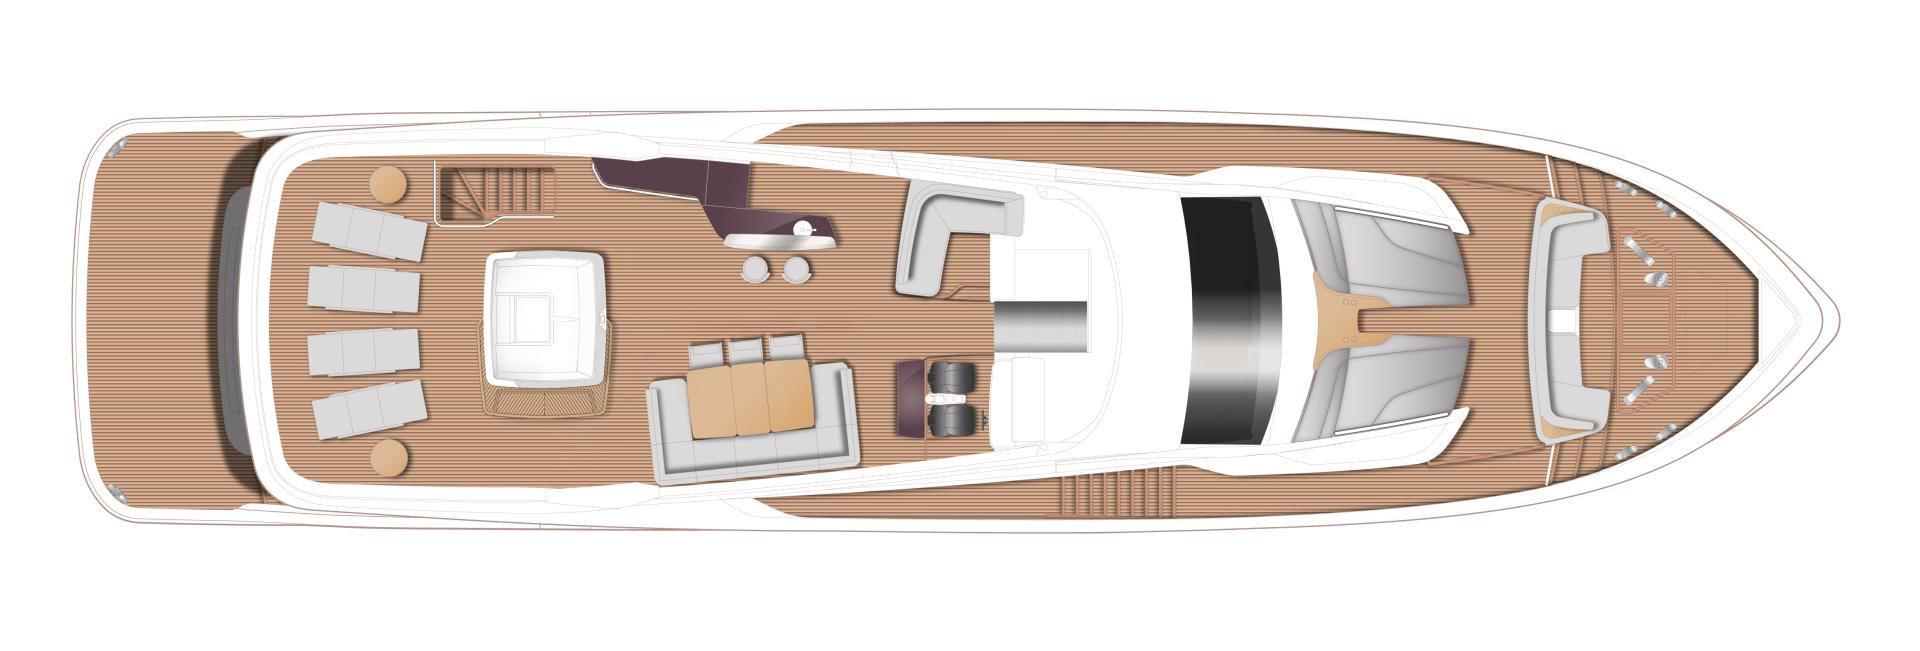 Princess-95 Motor Yacht 2022-Y95 Unknown-Florida-United States-1582779 | Thumbnail